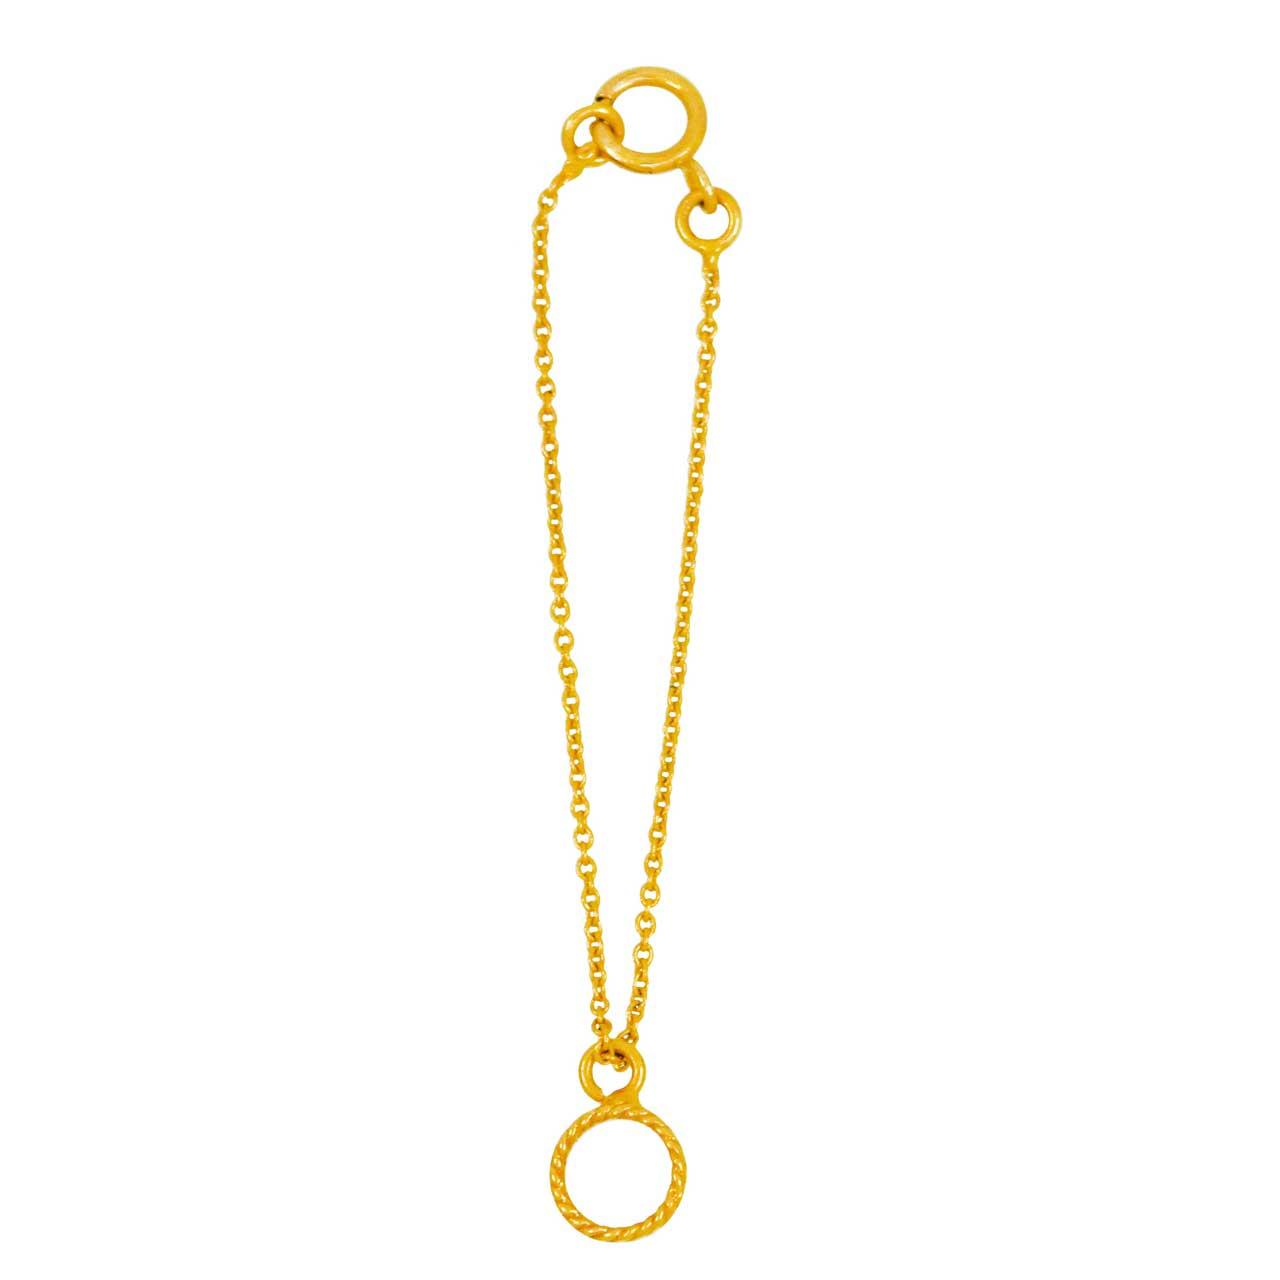 خرید آویز ساعت طلا 18 عیار کانیار گالری مدل AS22